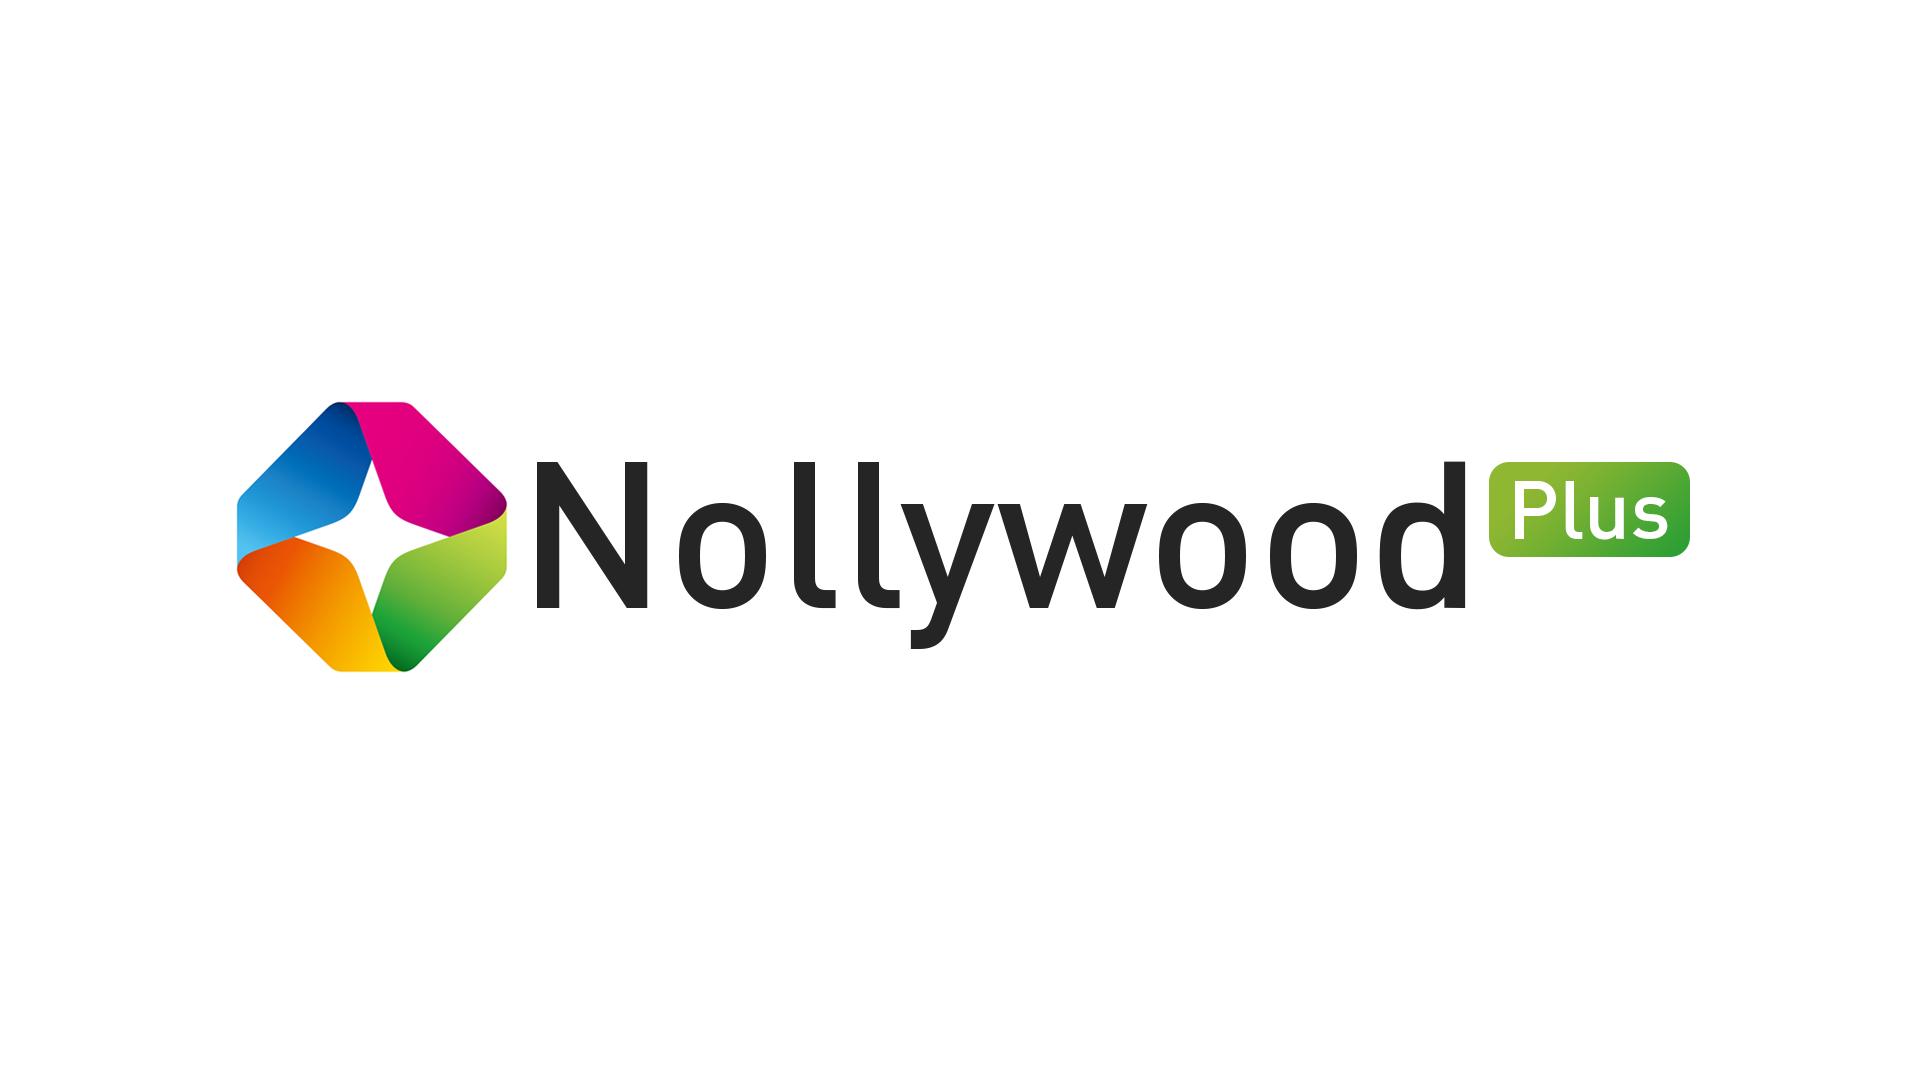 Nollywood Plus